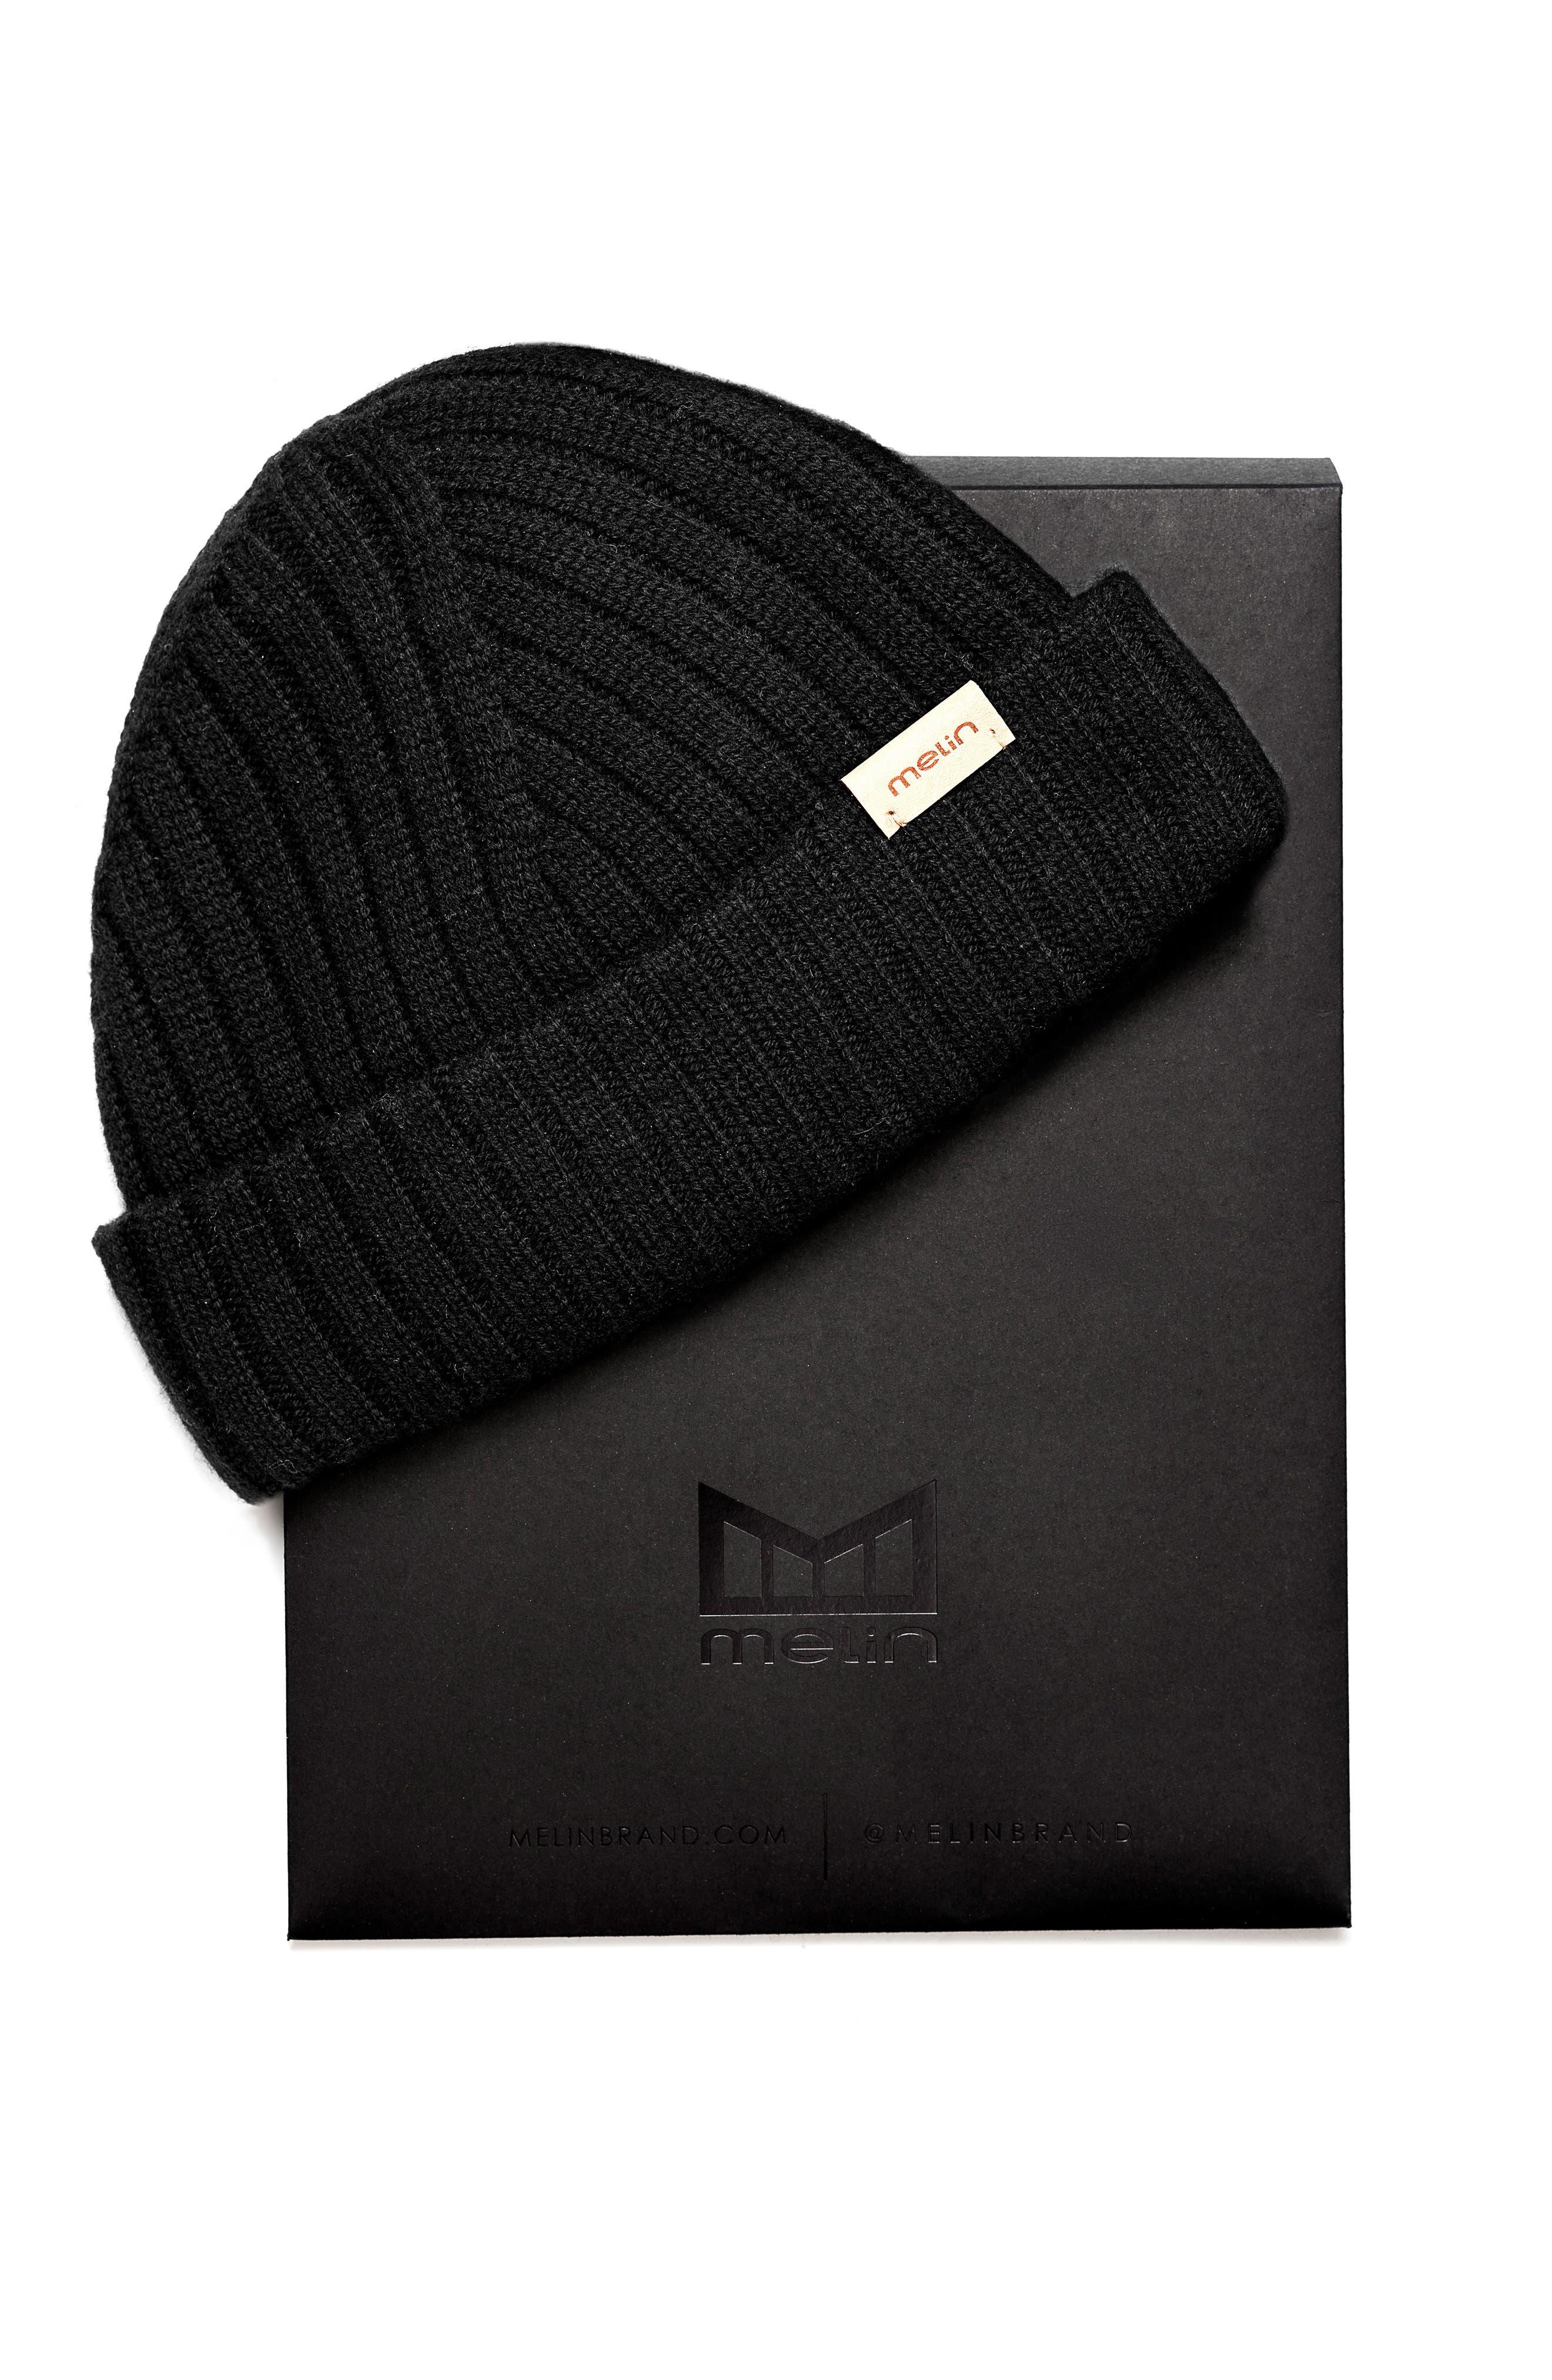 3ddc961958fd05 Men's Beanies: Knit Caps & Winter Hats | Nordstrom